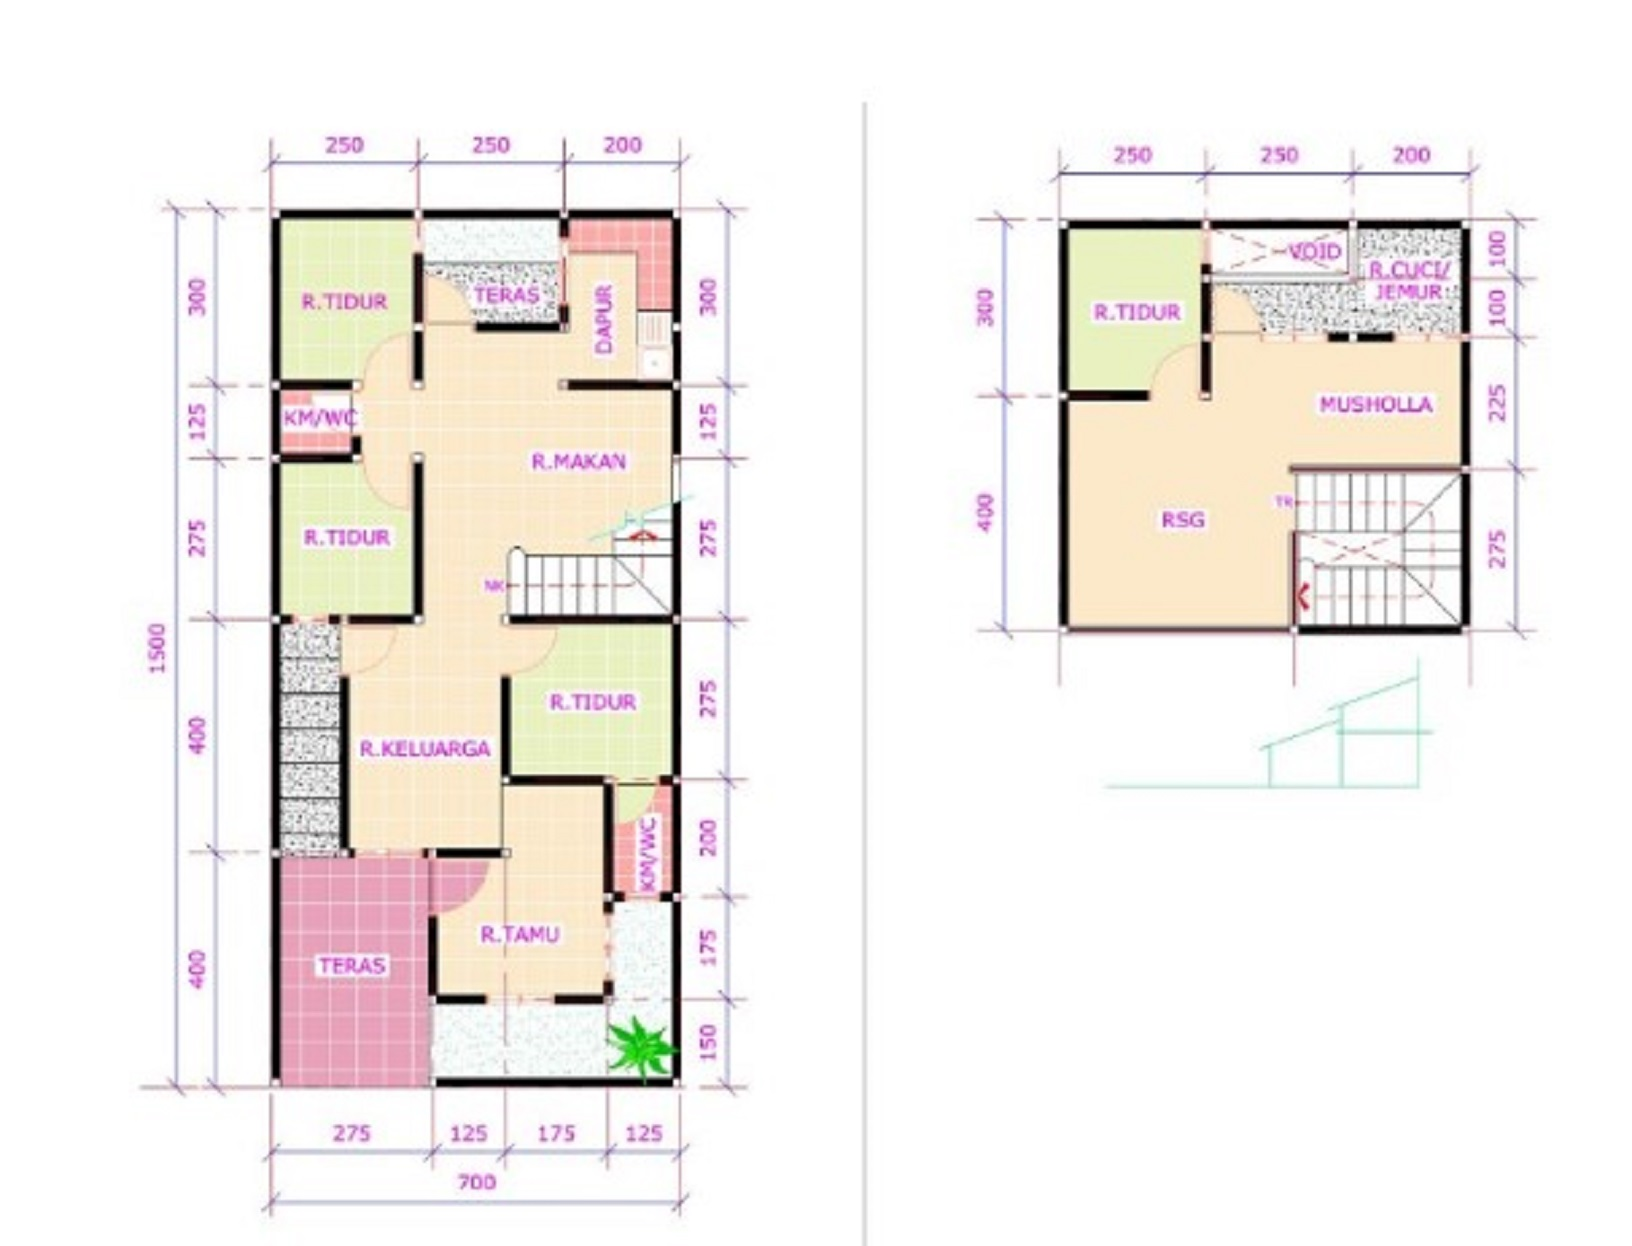 Denah Rumah Minimalis Sederhana 2 Lantai